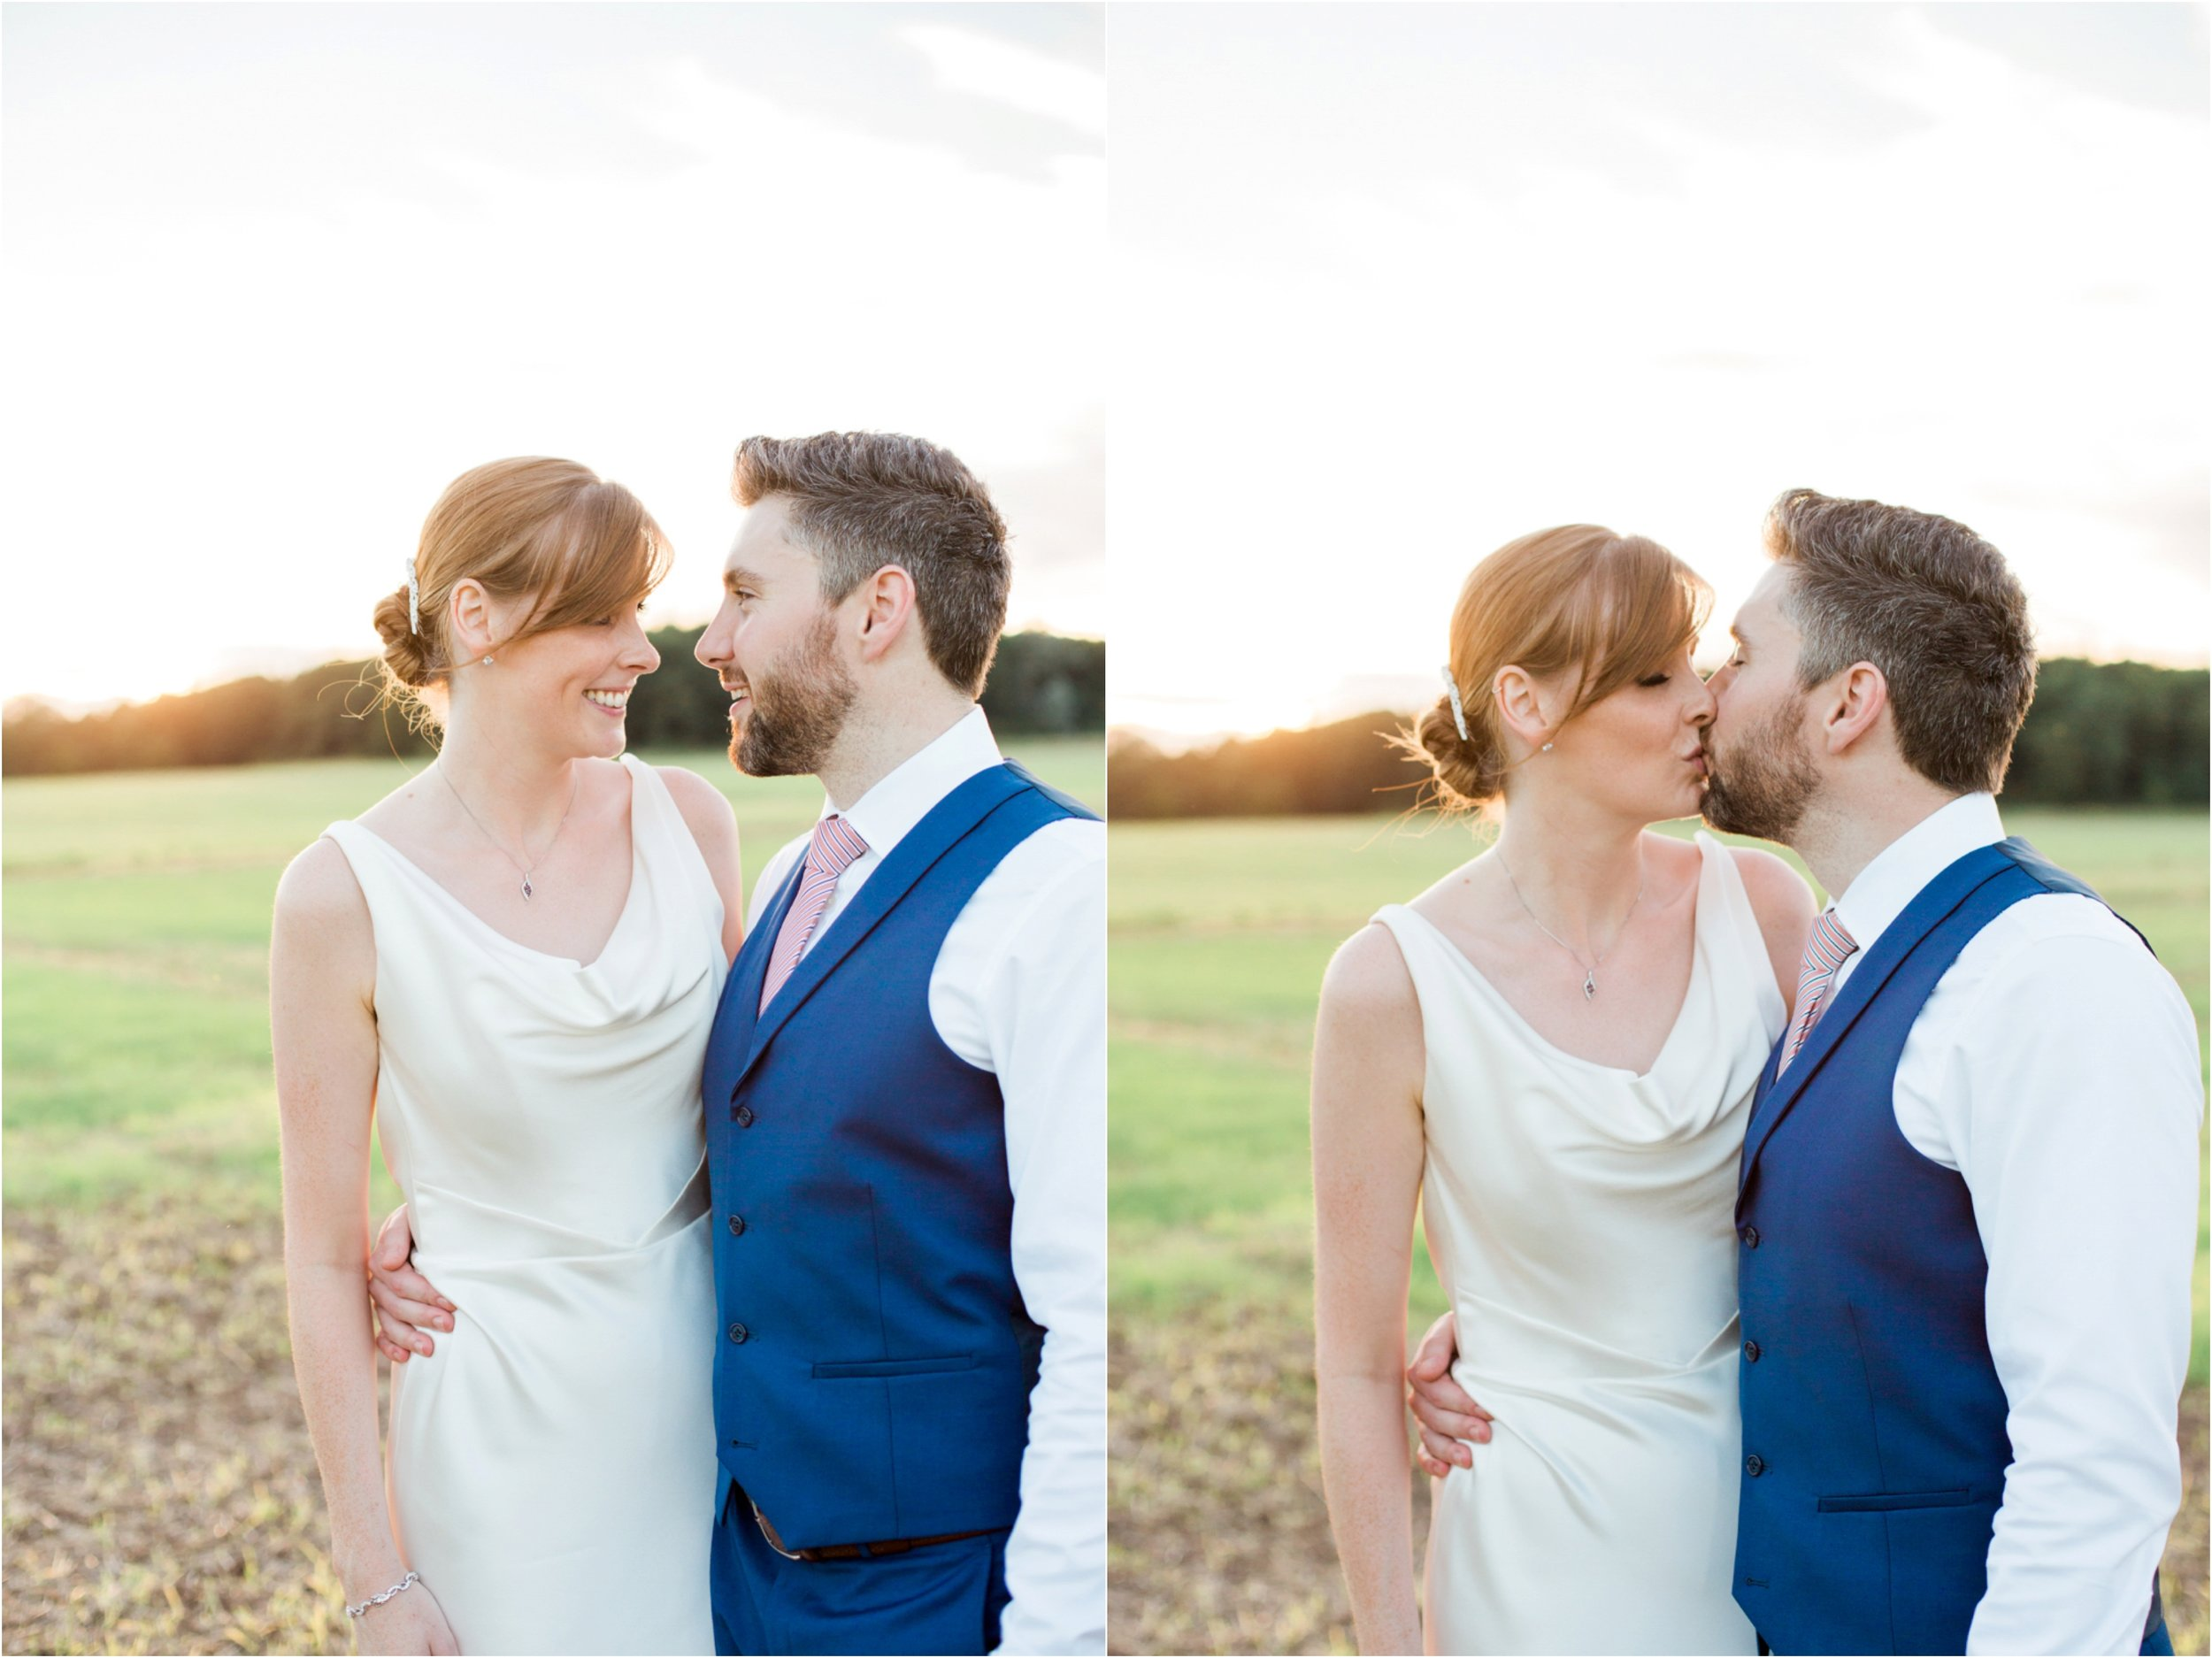 Sophie Evans Photography, Claire & John, Swallows Nest Barn Wedding, Warwickshire Wedding Photographer-178.jpg